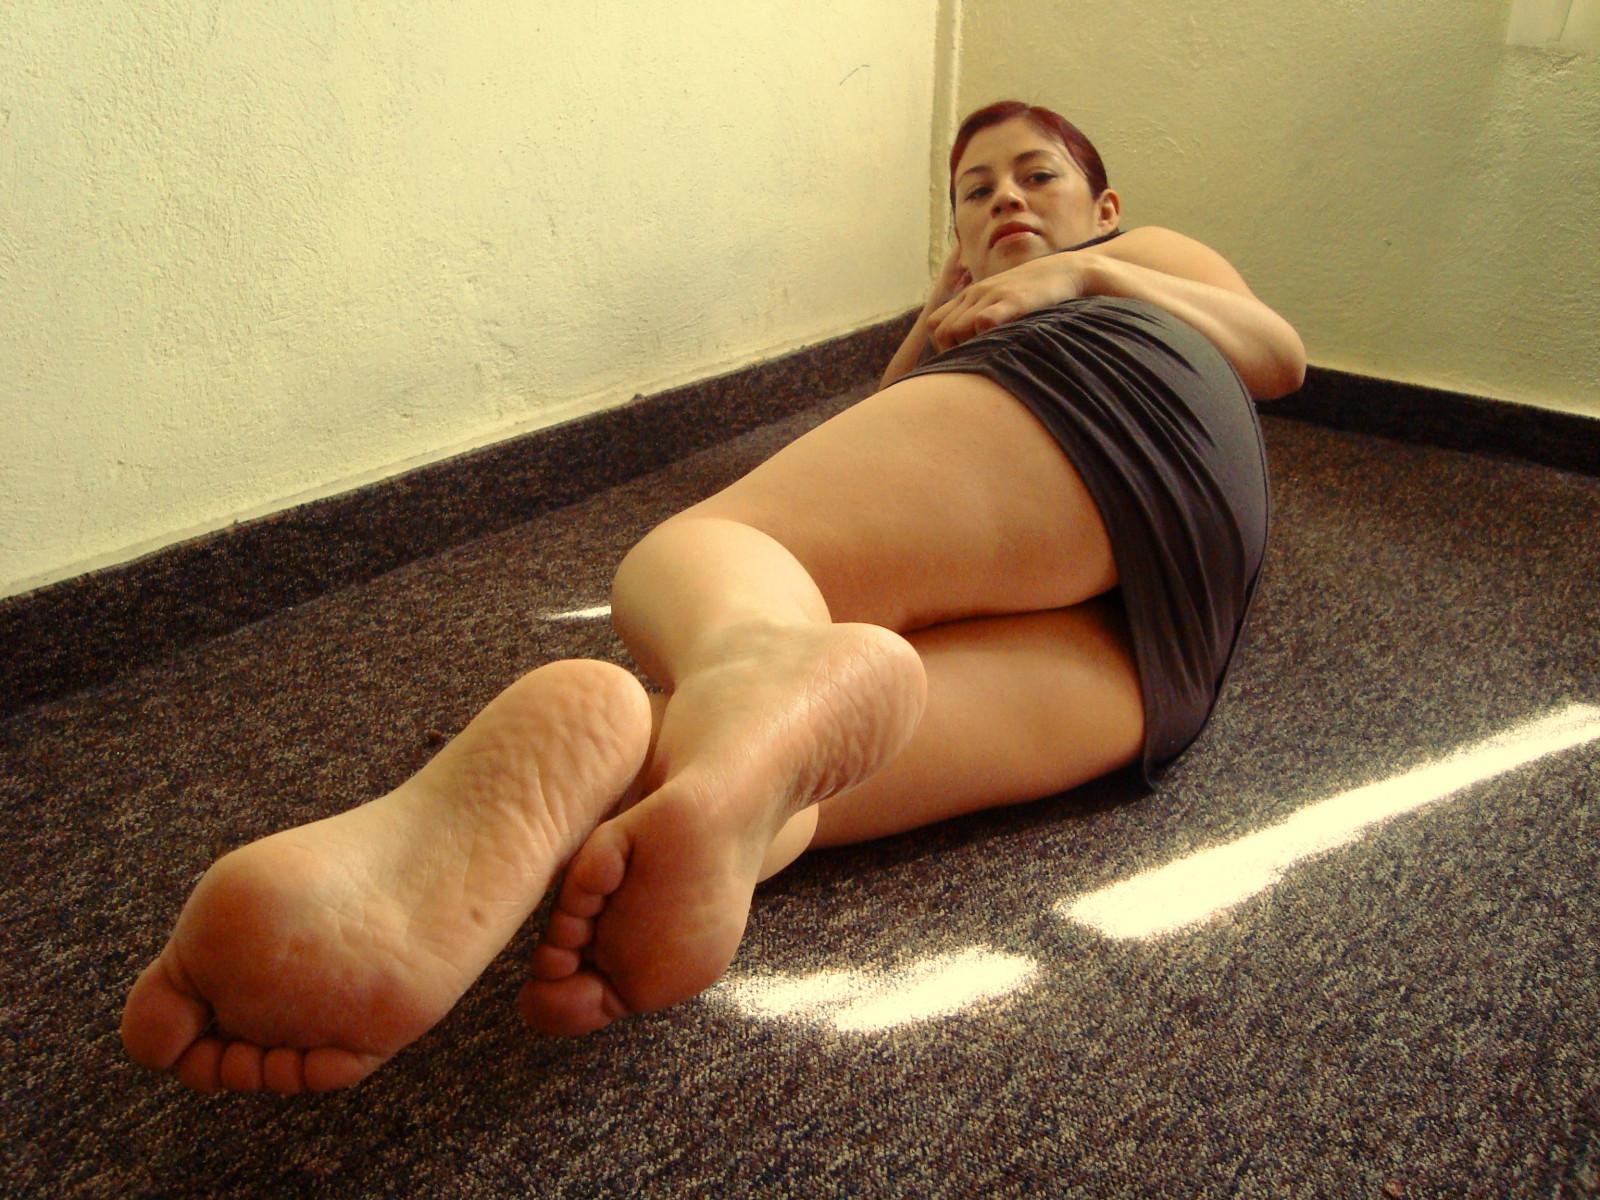 Wallpaper  Sitting, Feet, Clothing, Foot, Sexy, Leg, Sole -9751